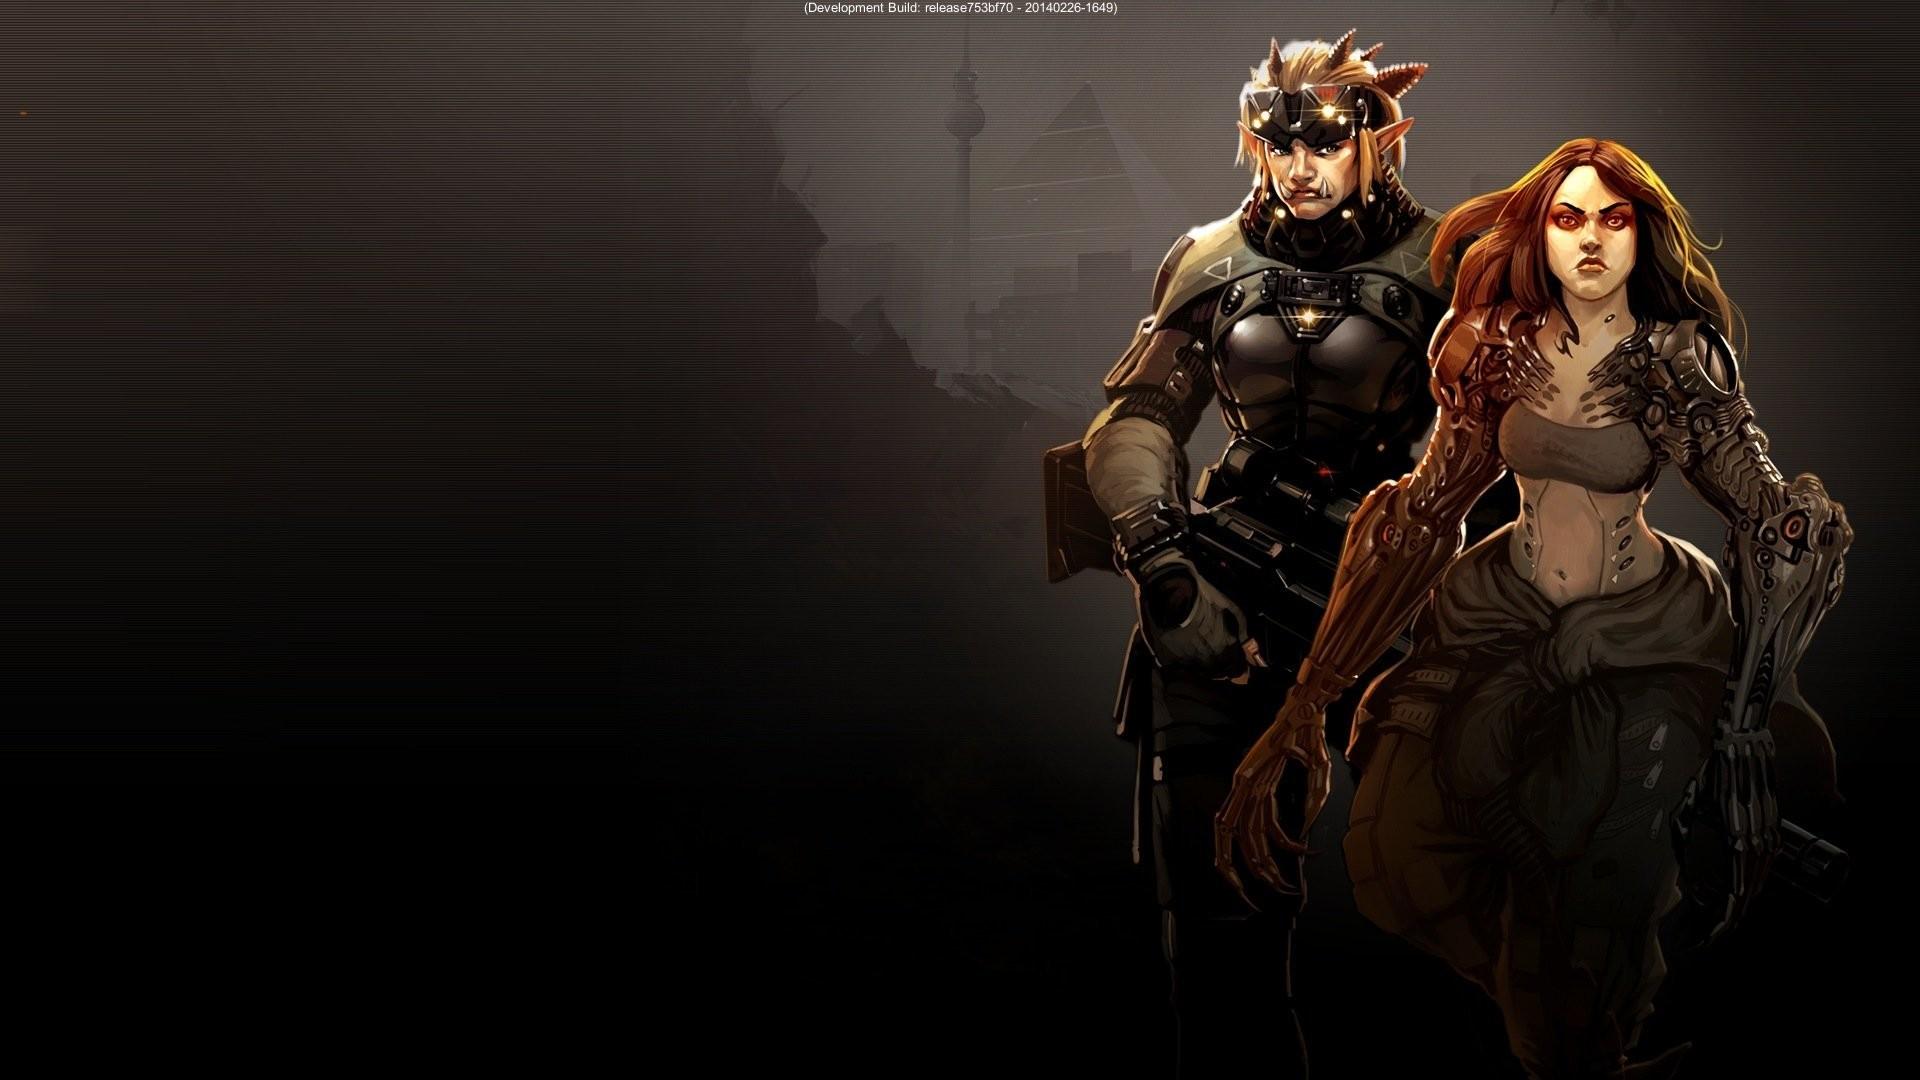 SHADOWRUN cardgame game mmo online fantasy sci-fi warrior fighting  cyberpunk shooter (17) wallpaper | | 348423 | WallpaperUP